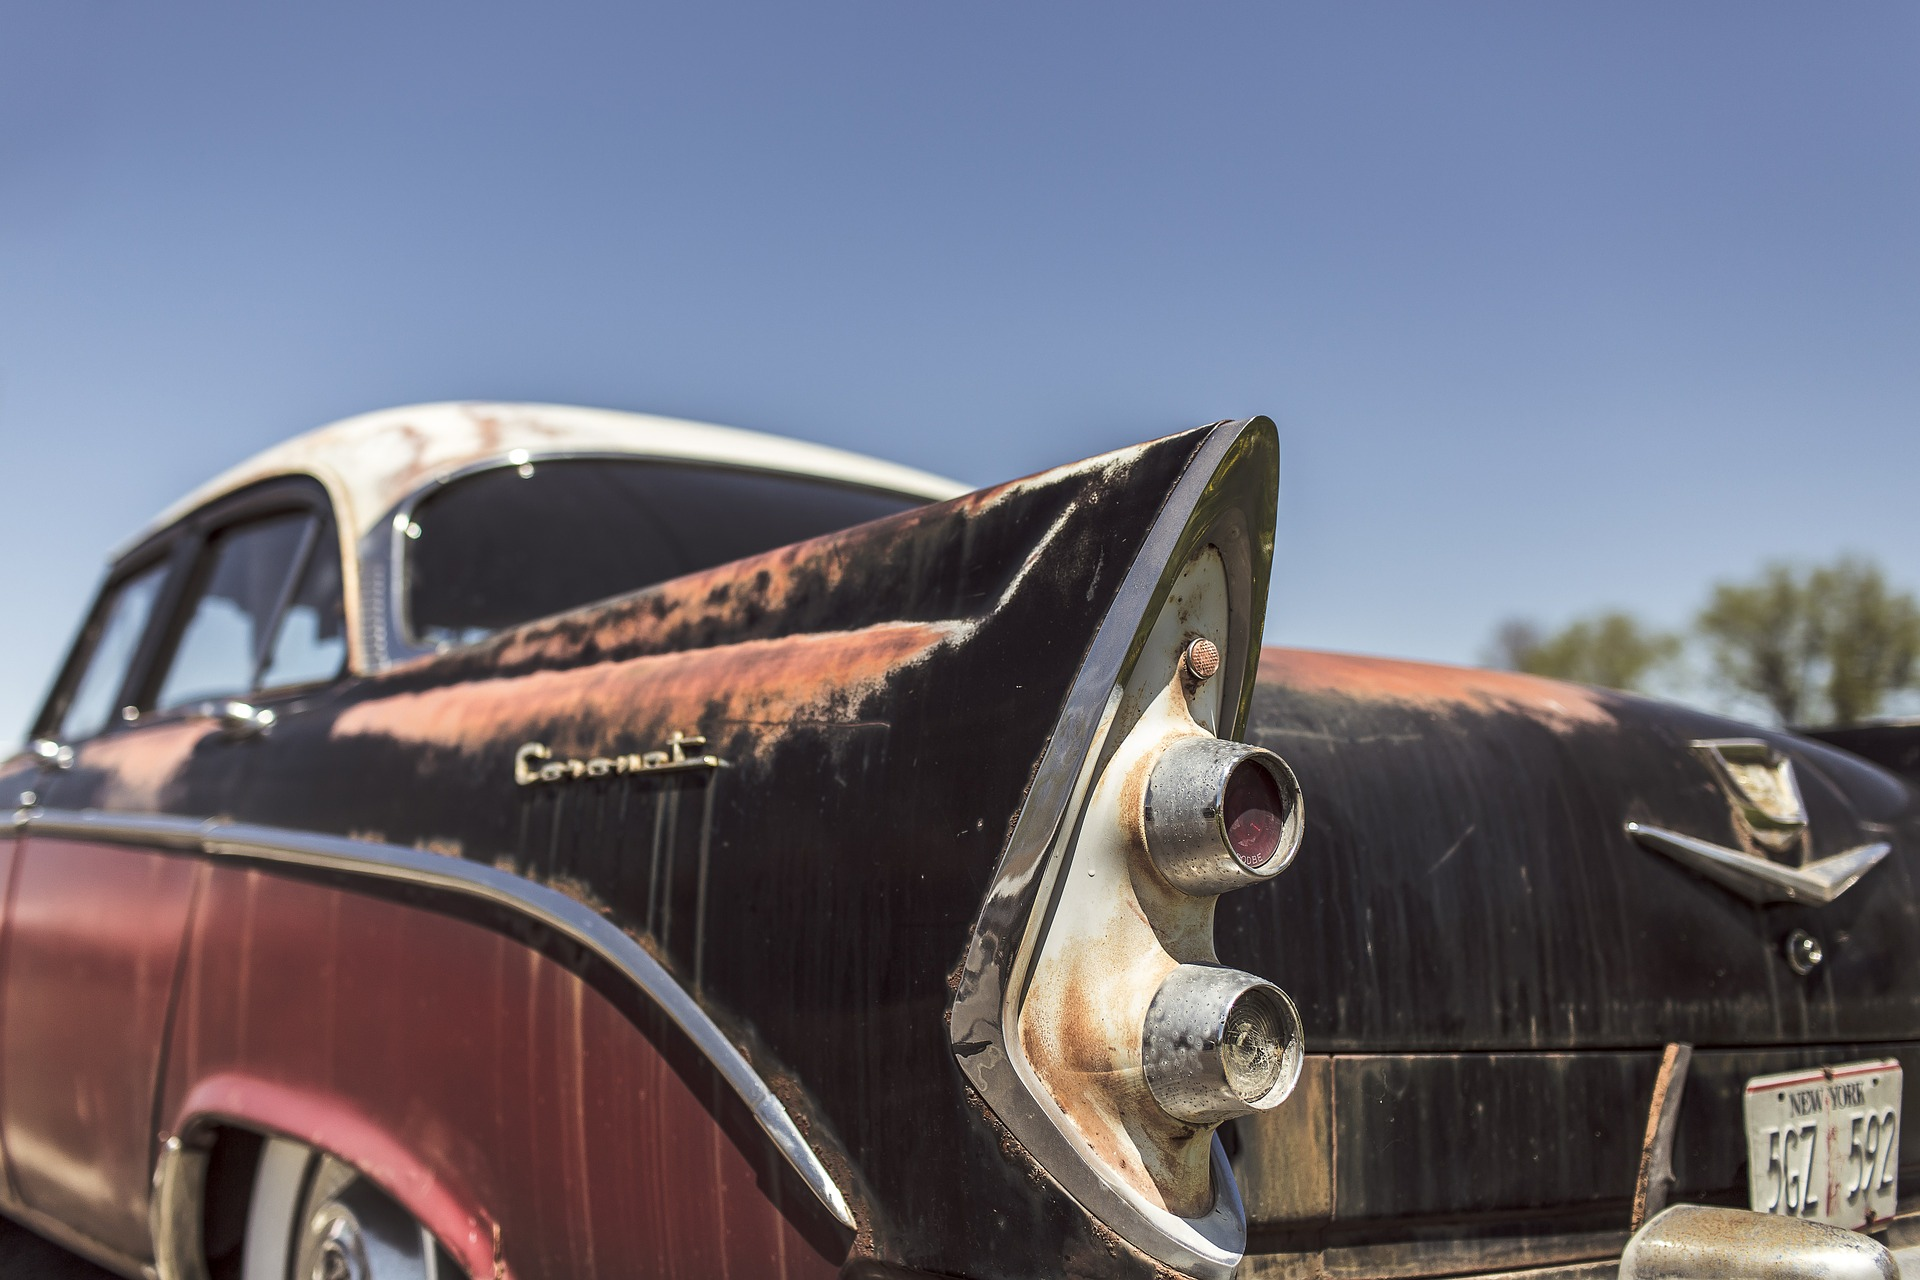 faded vintage car